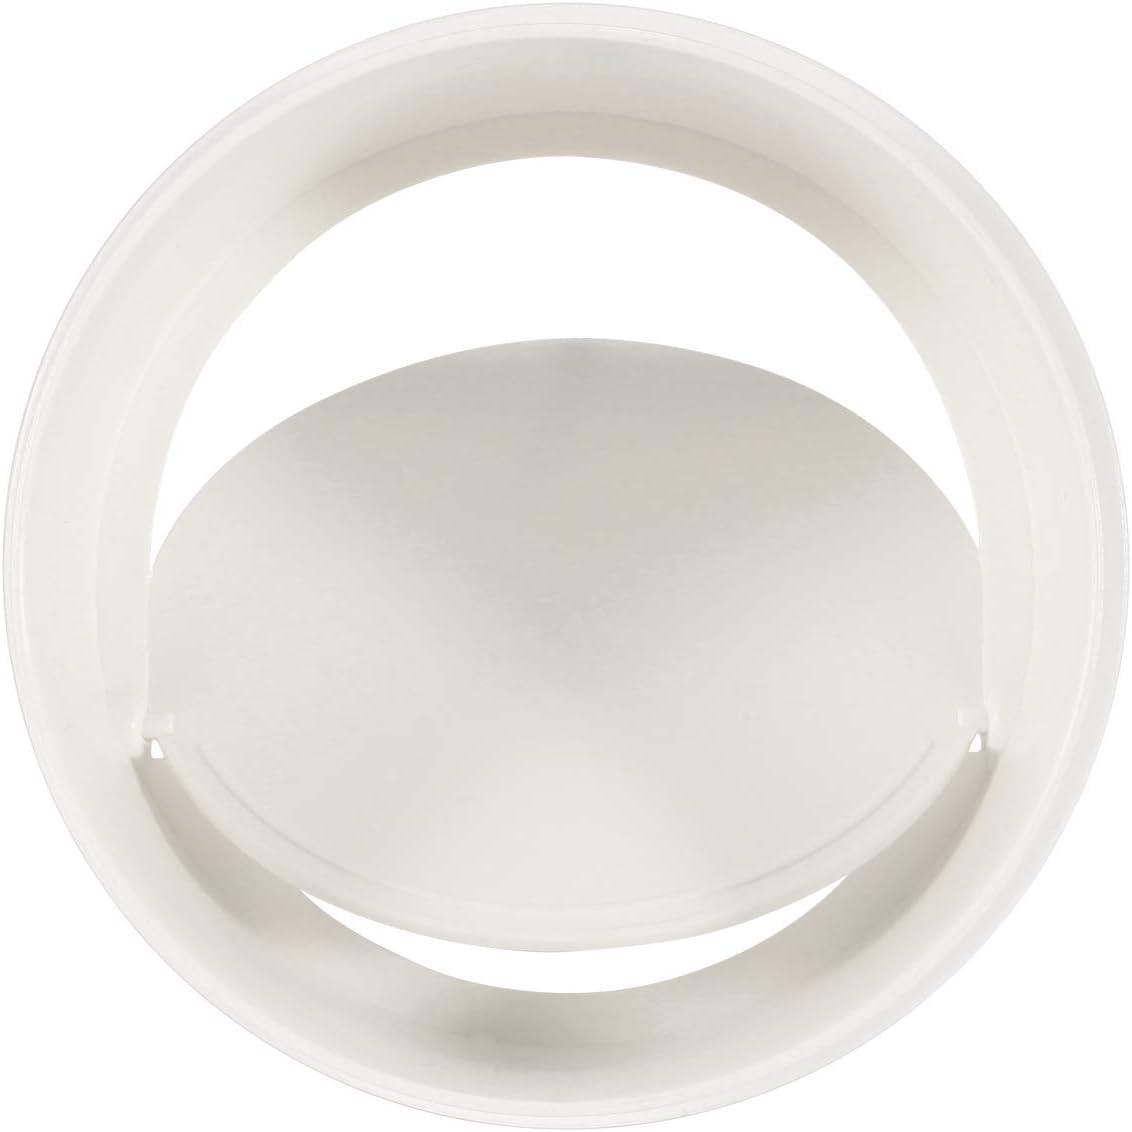 Hon&Guan 6 Inch Plastic Back Draft Damper, Draft Blocker Damper Inline for Extractor Fan Vent Back Draught Shutter (150 mm)